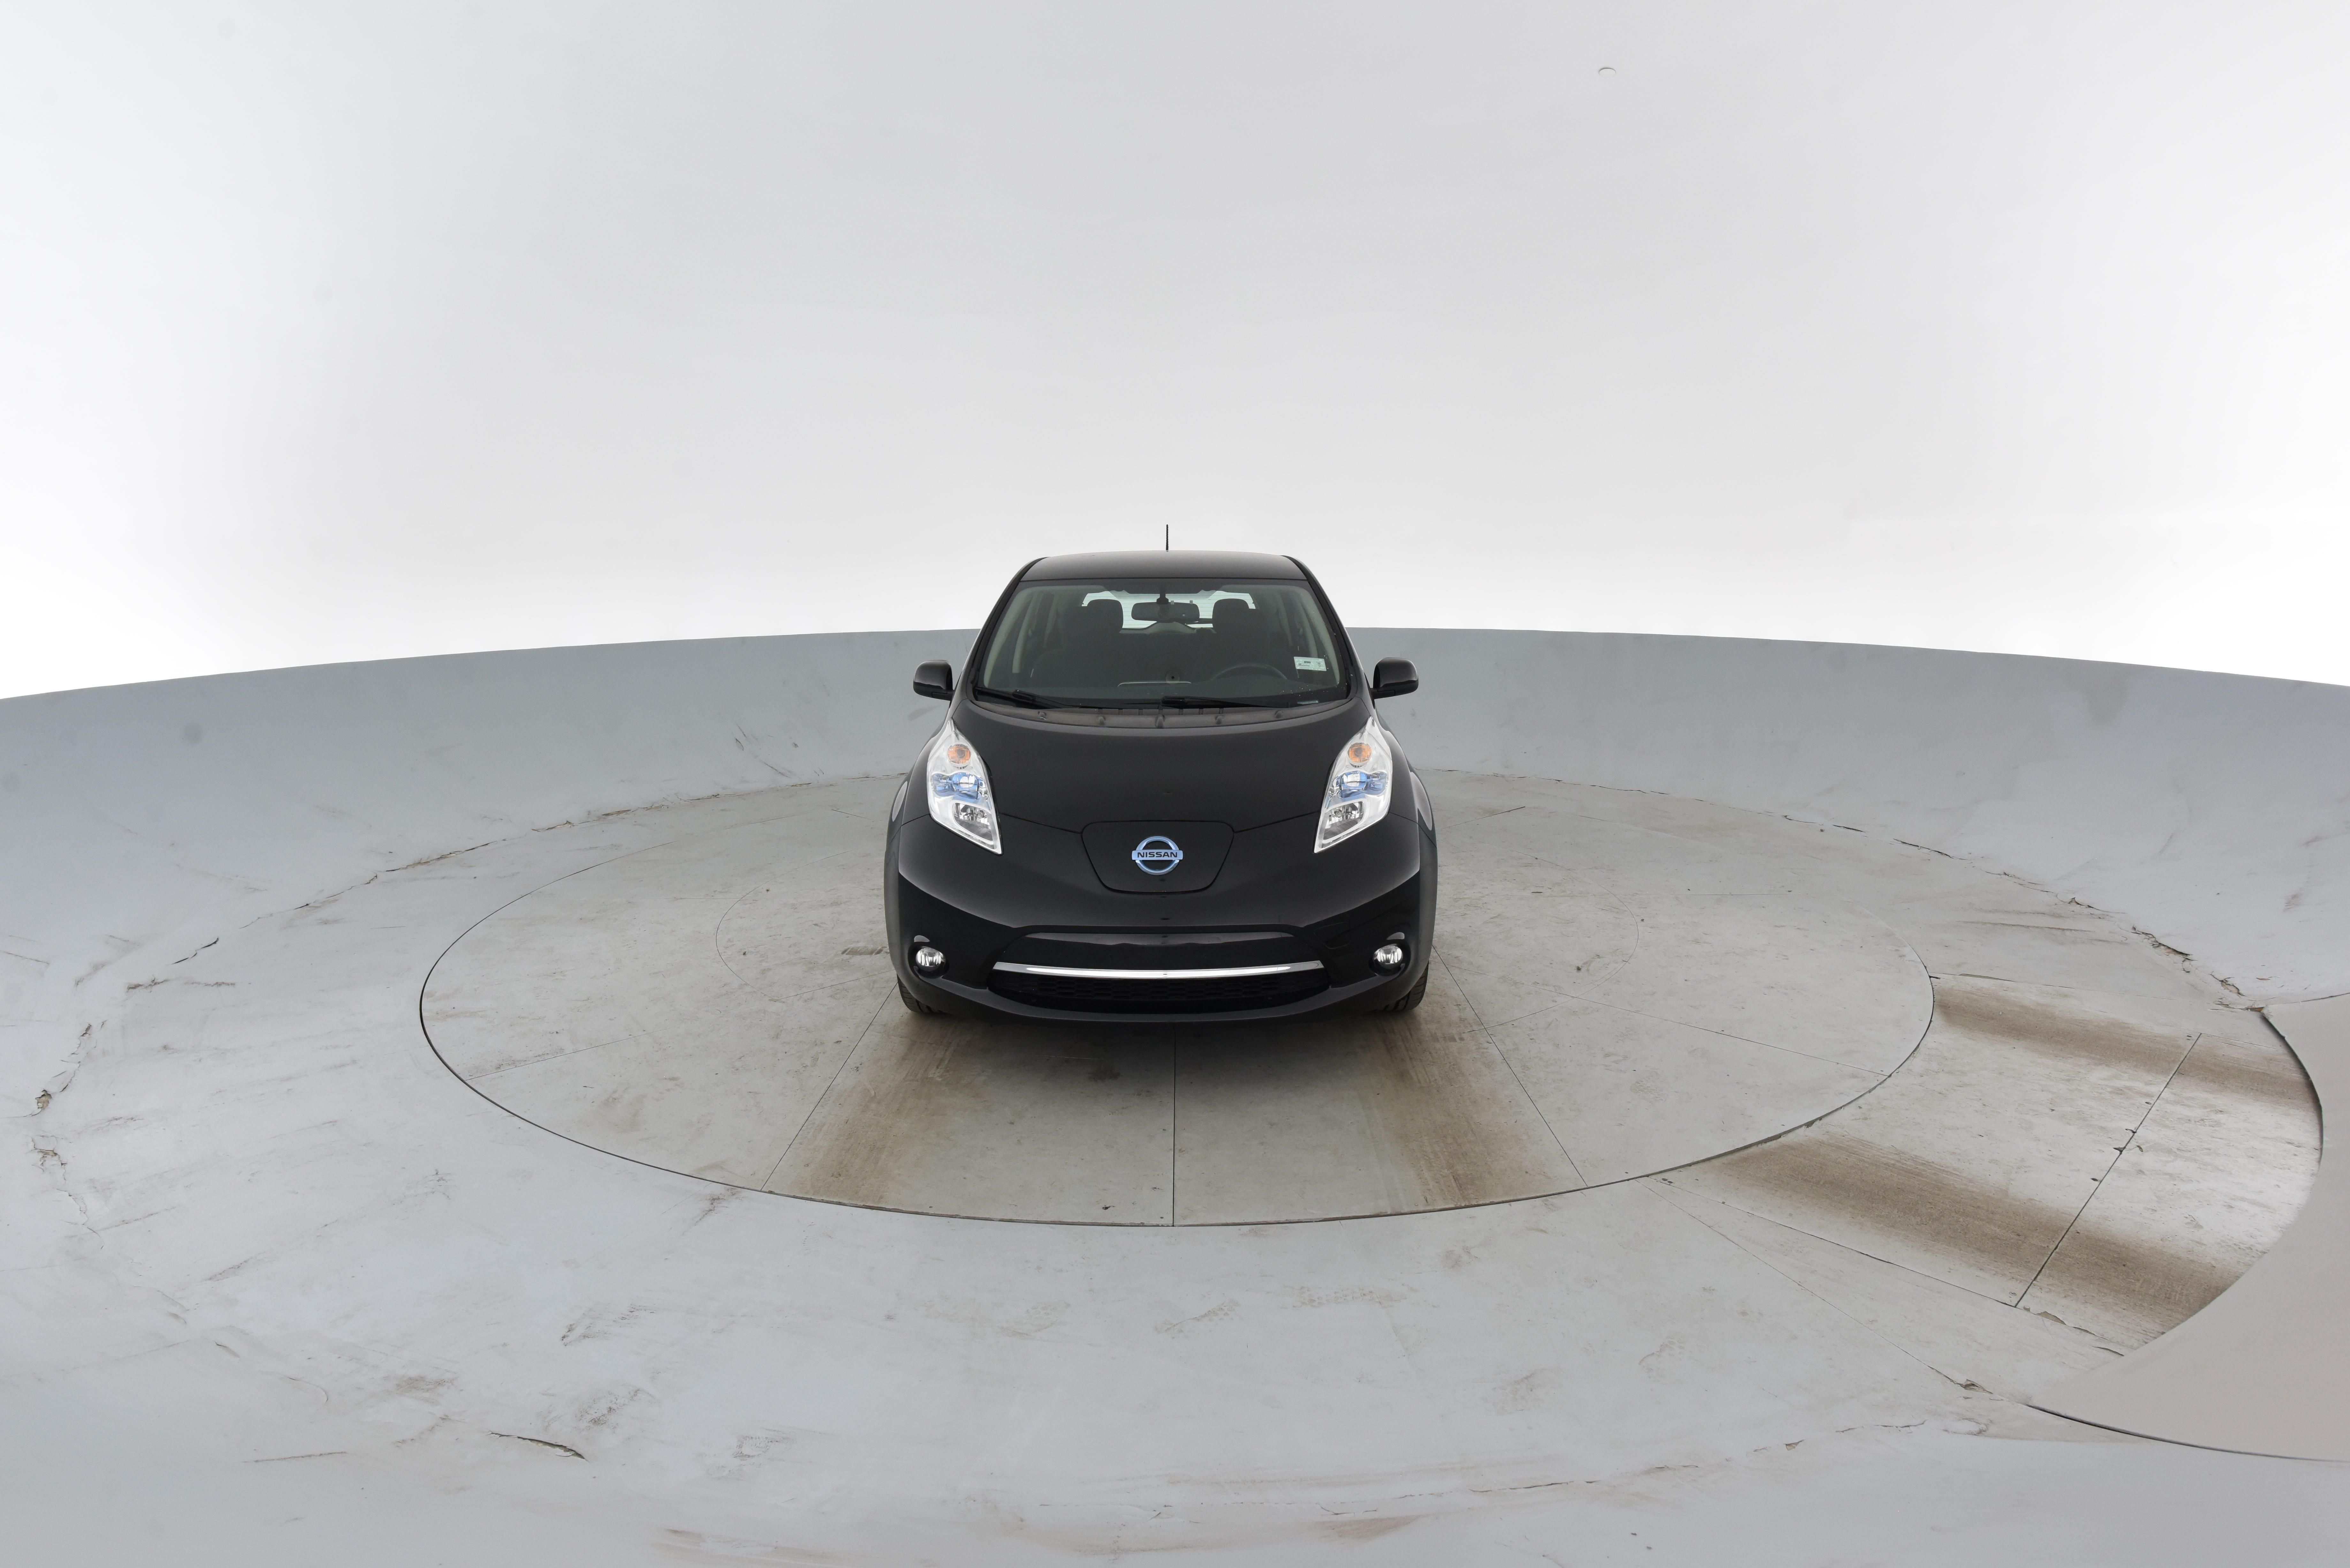 2015 Nissan LEAF Euclid OH